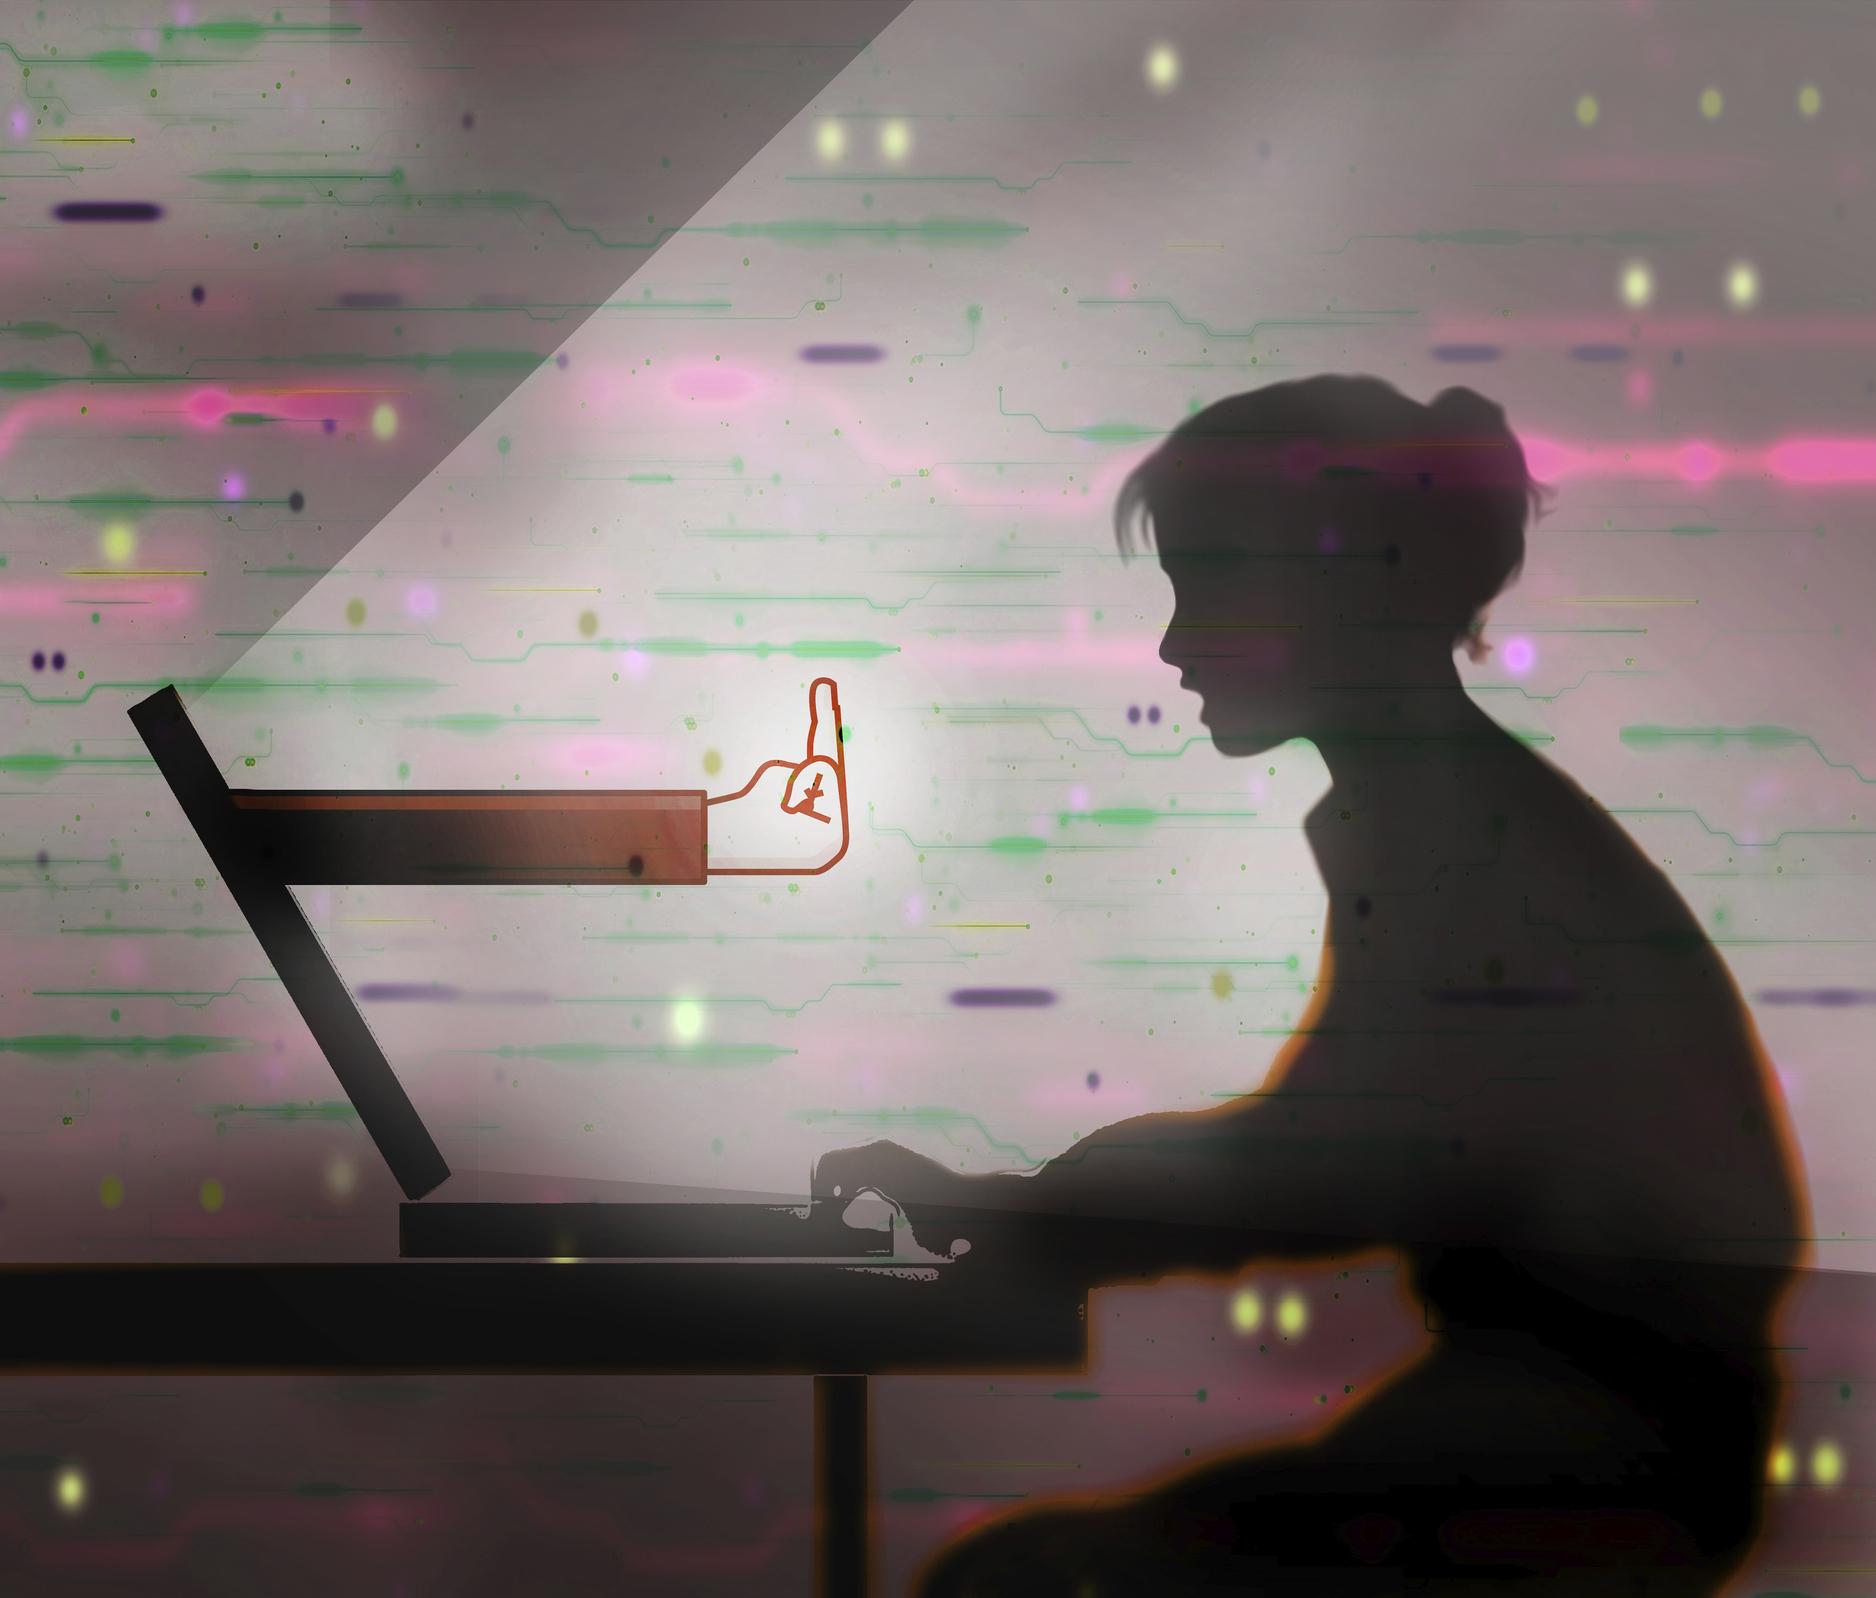 ujsagiro-internet-zaklatas